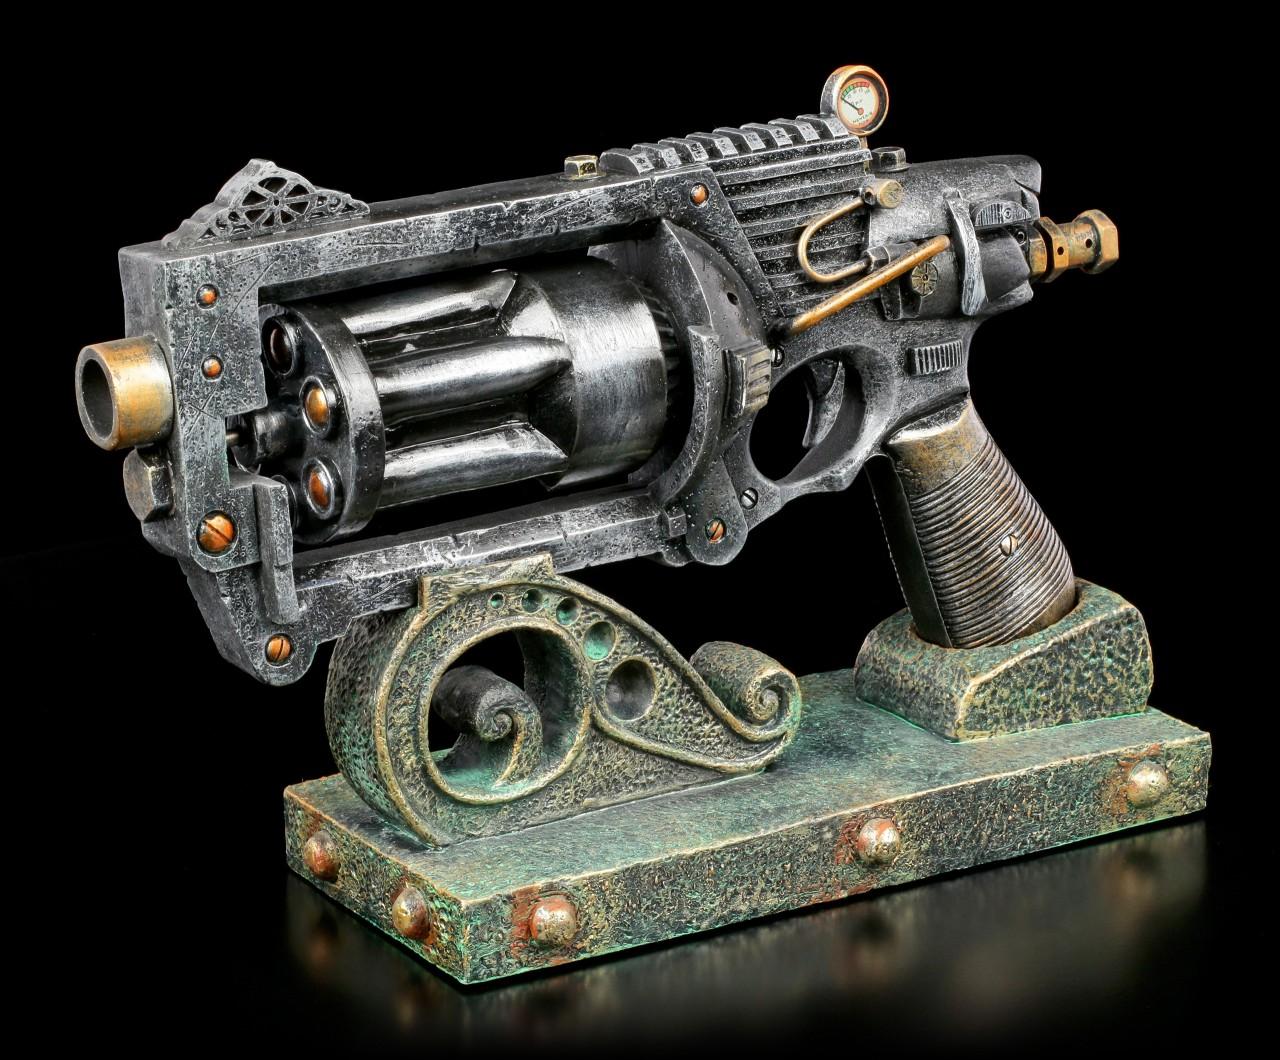 Steampunk Decoration Gun - The Big Daddy